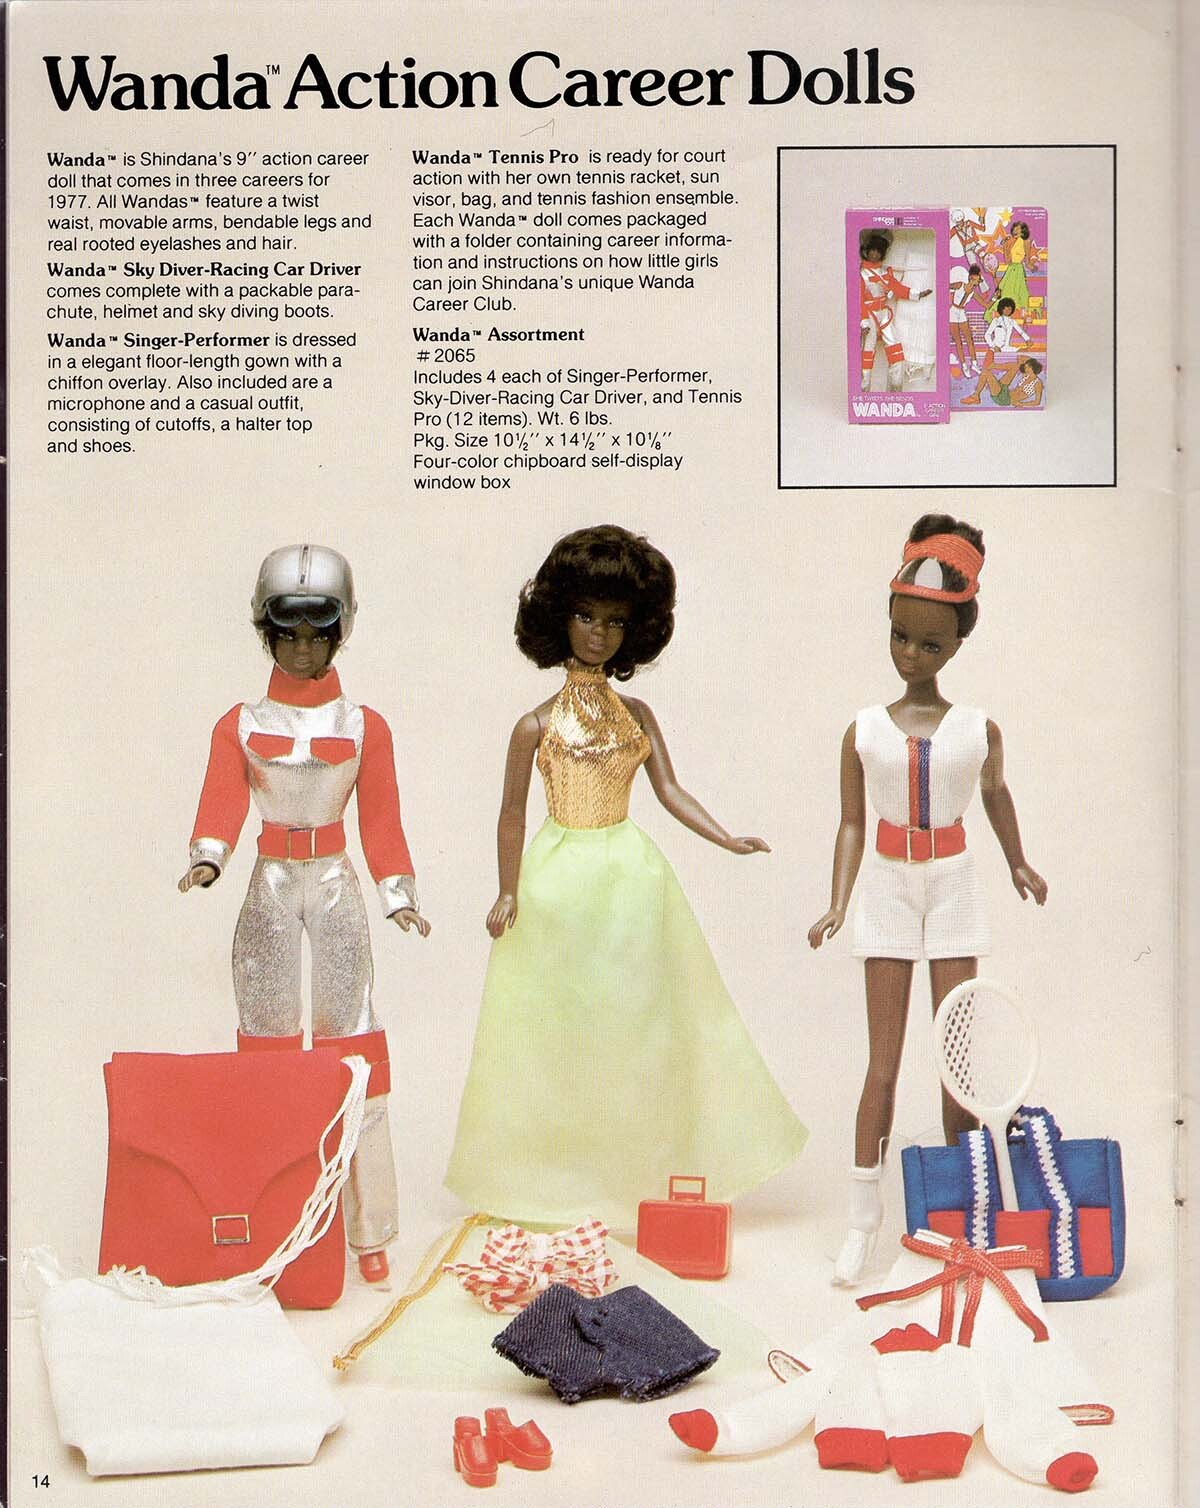 The Wanda Action Career Dolls